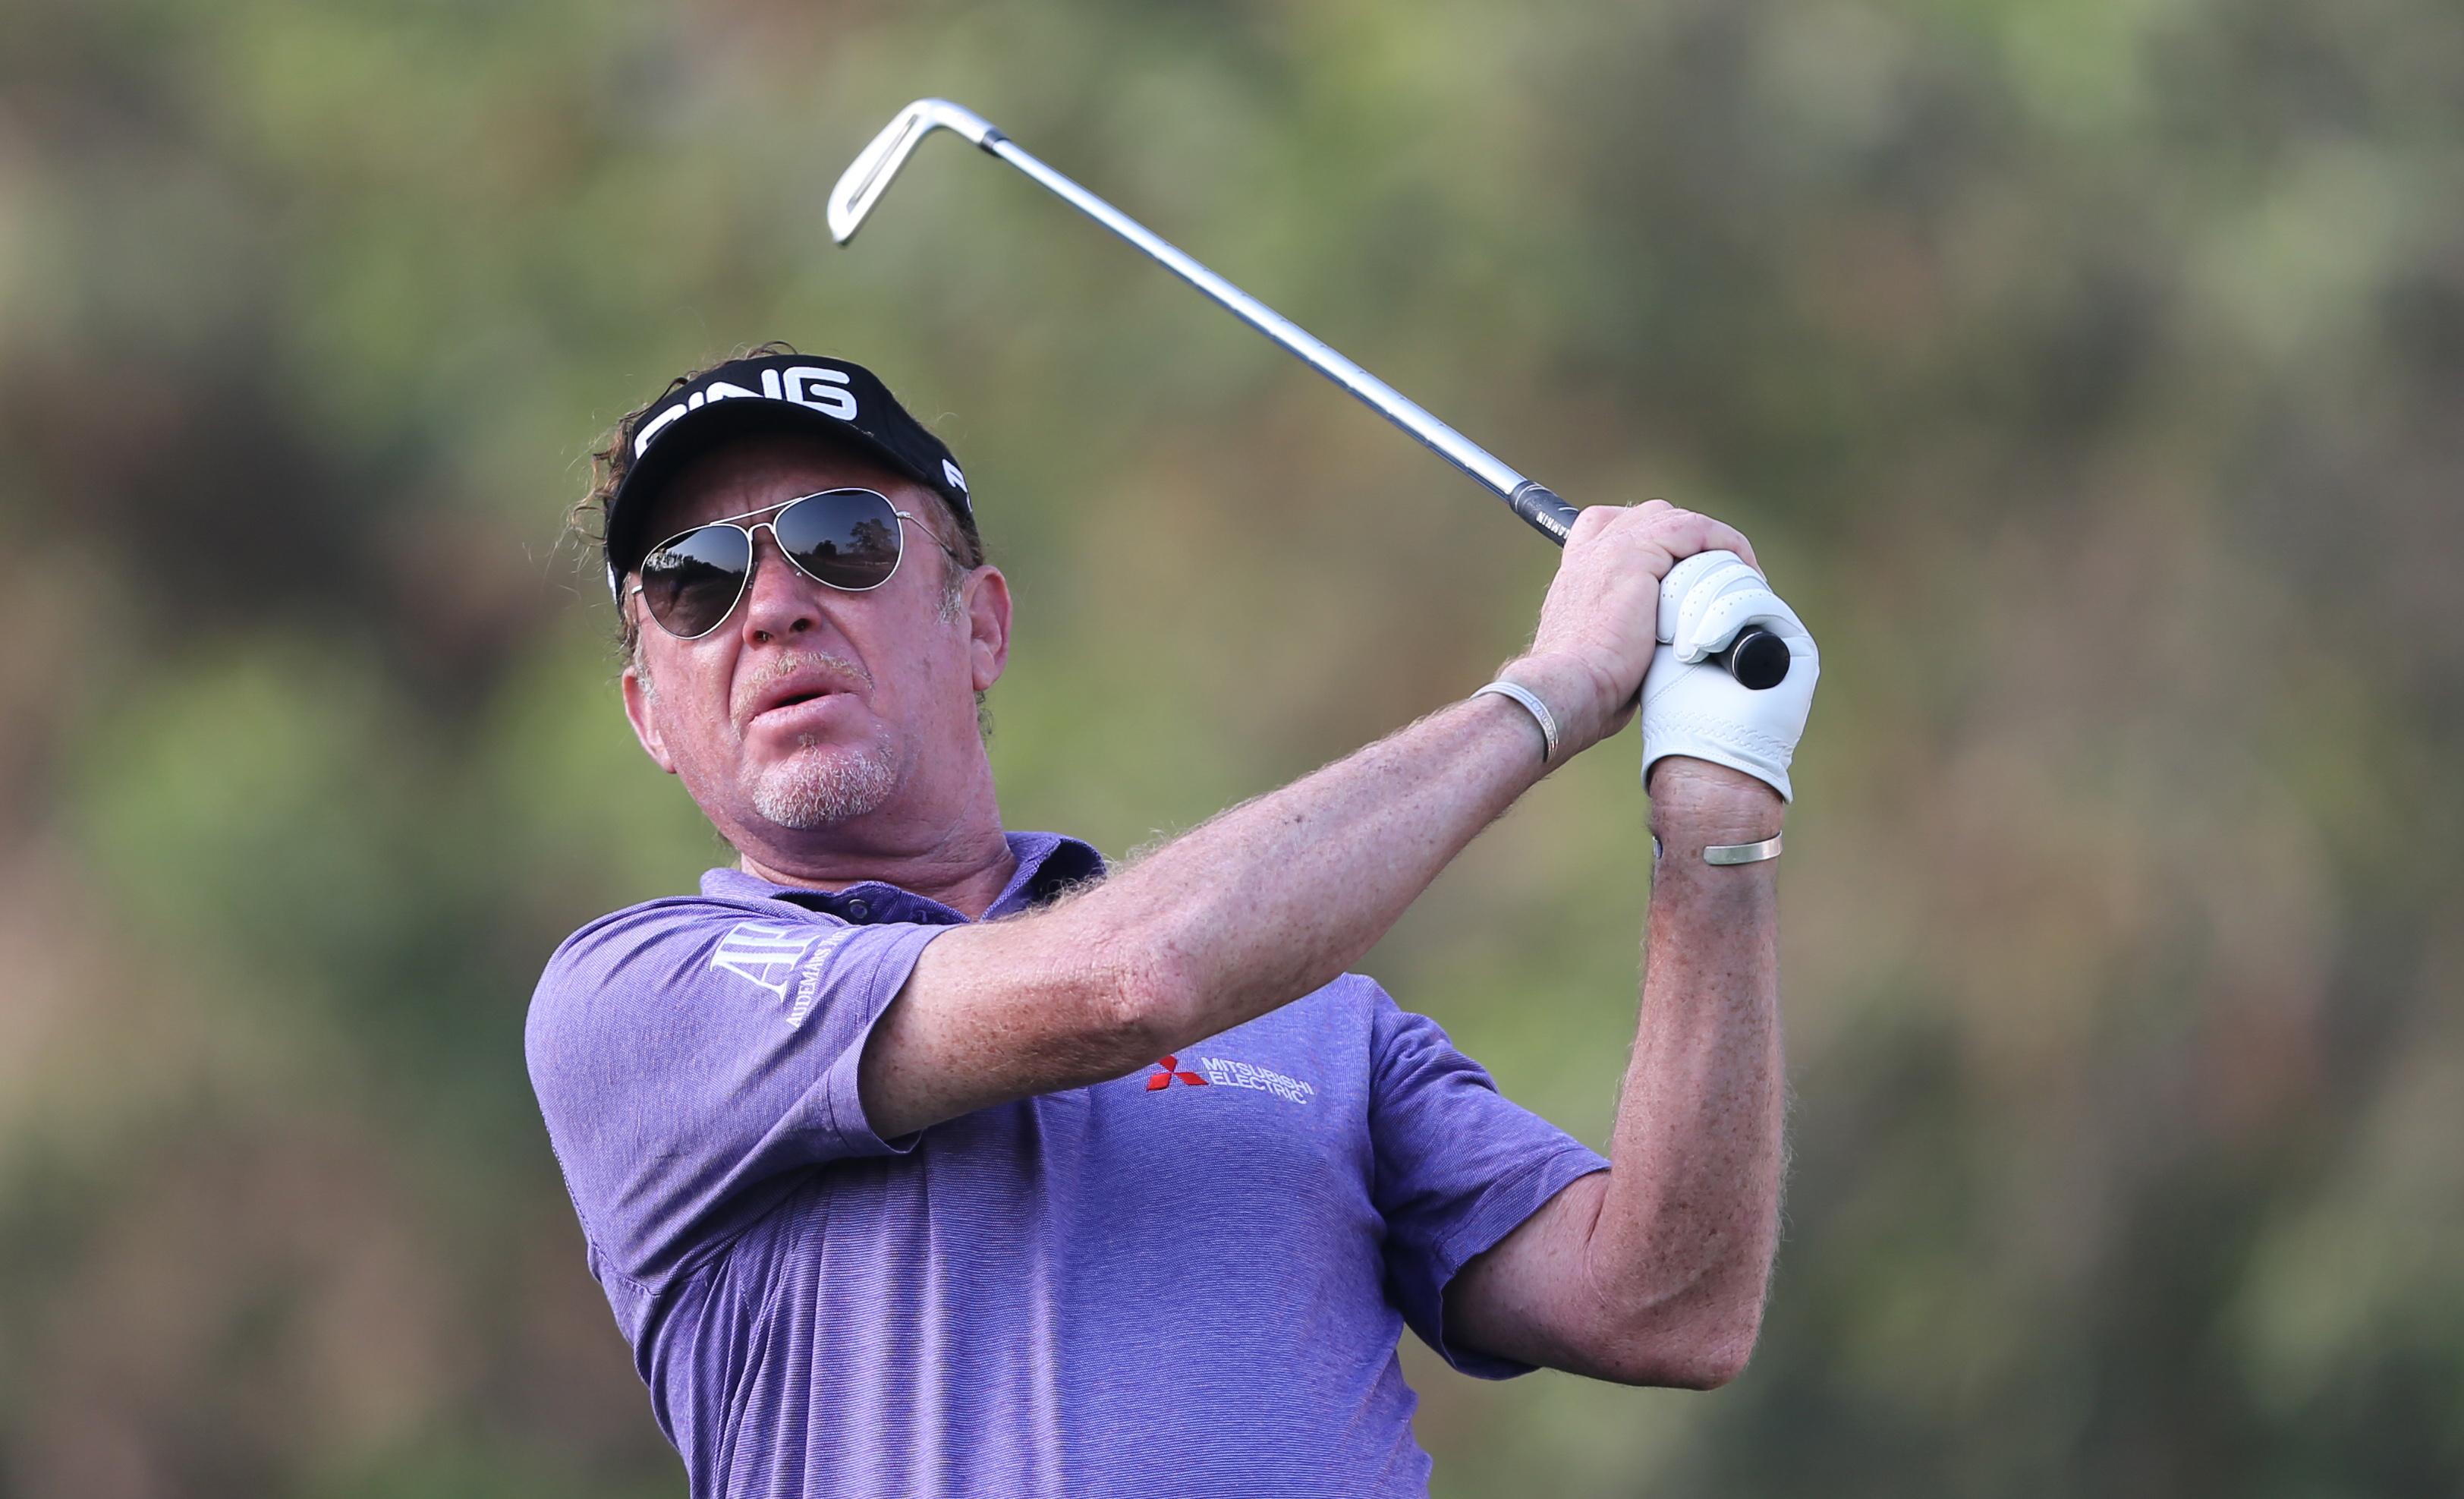 Miguel Angel Jimenez of Spain plays a shot on the 11th hole during 1st round of the Omega Dubai Desert Classic golf tournament in Dubai, United Arab Emirates, Thursday, Feb. 4, 2016. (AP Photo/Kamran Jebreili)